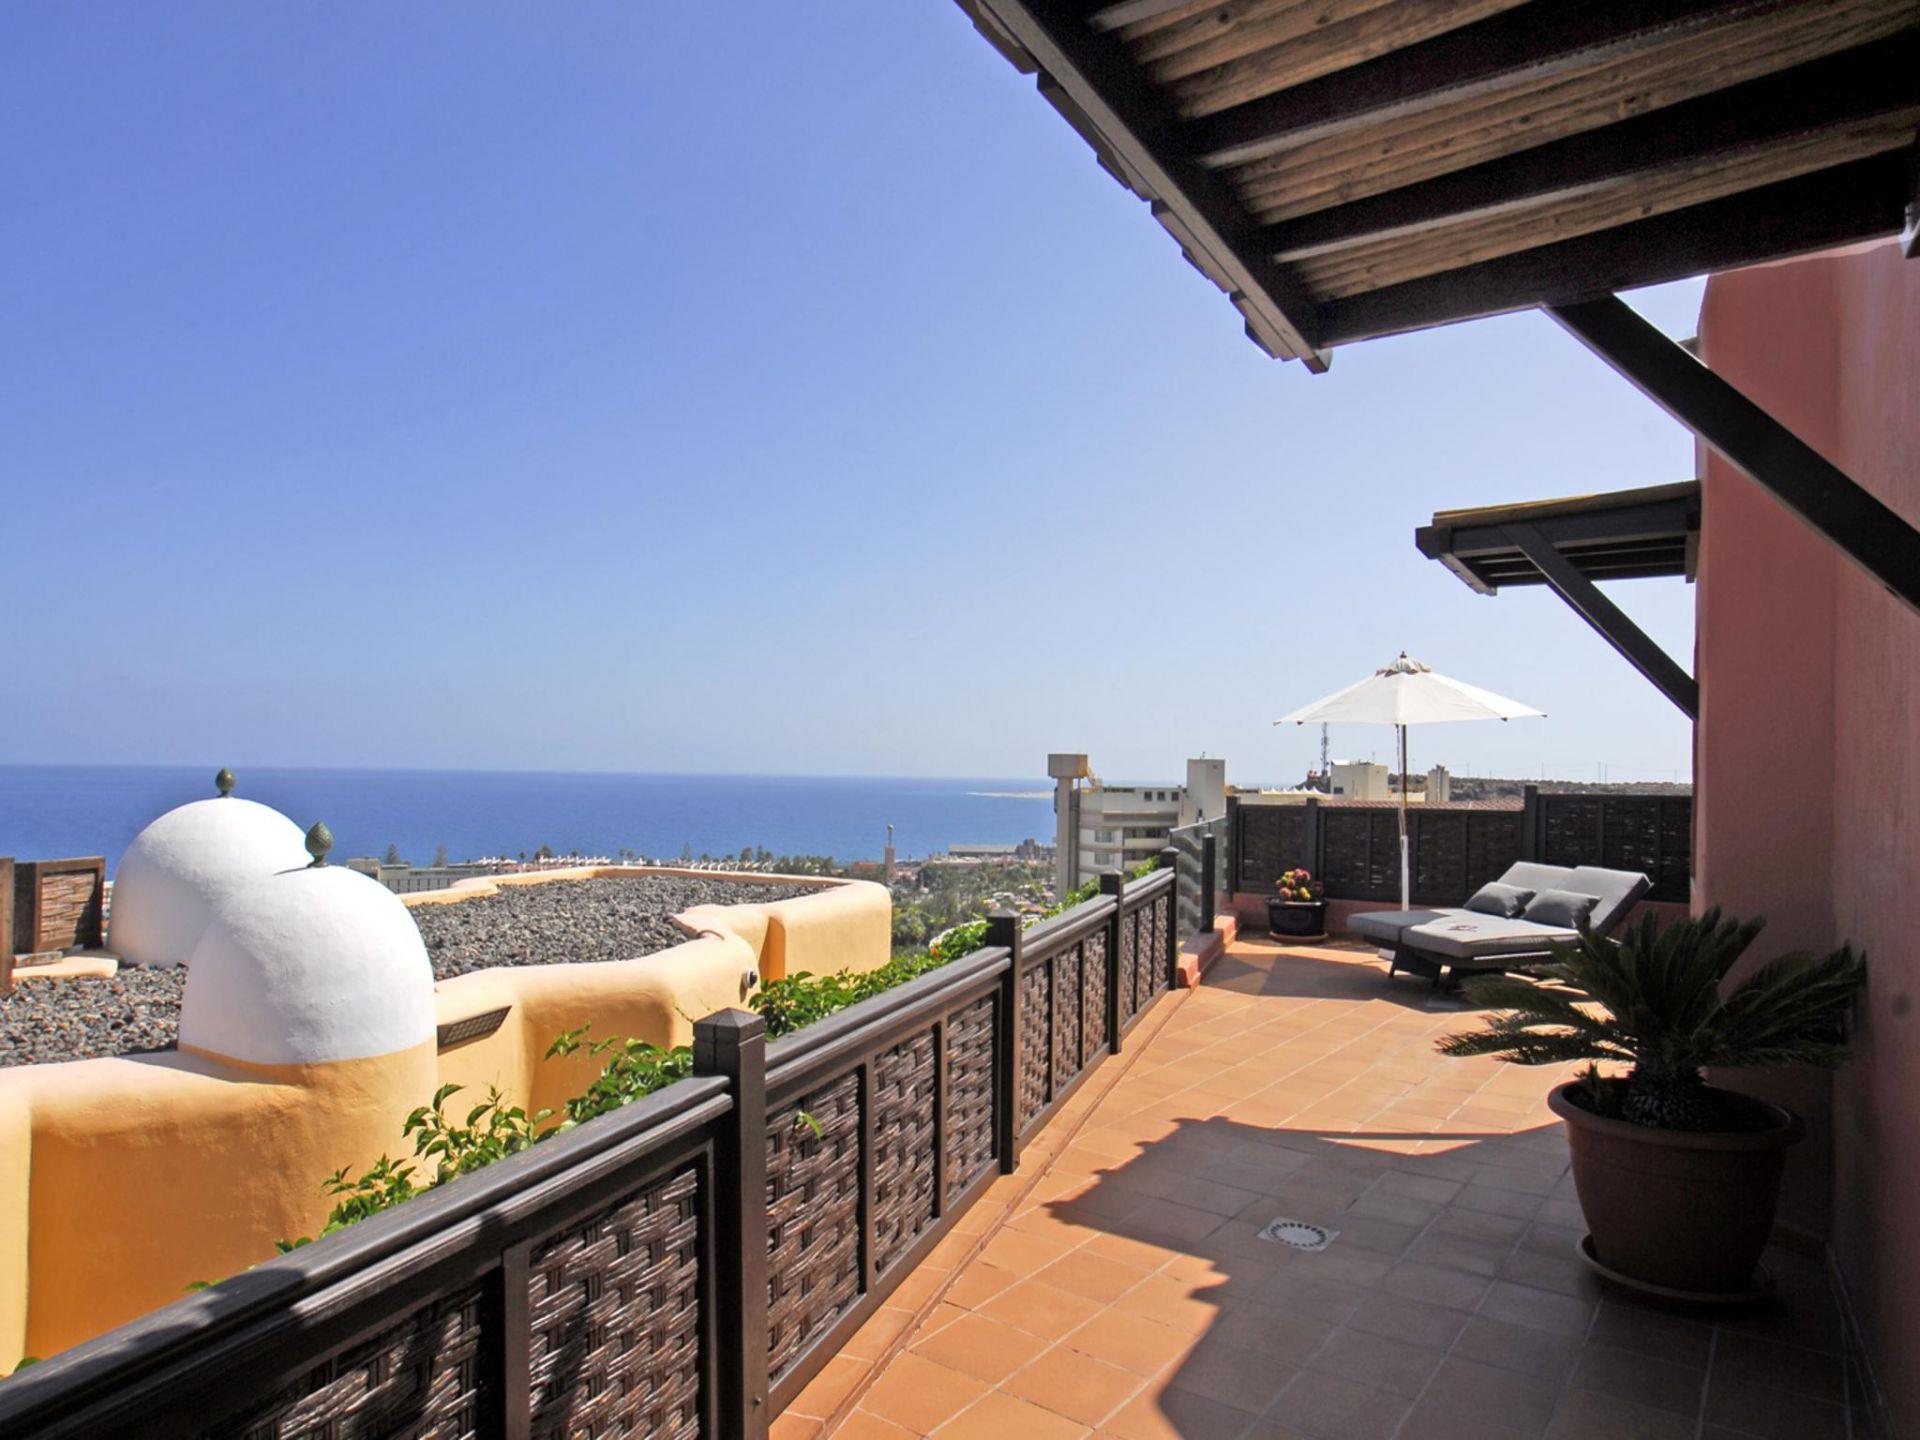 Holiday apartment Villa San Agustin 10 - Holiday Rental (854295), Maspalomas, Gran Canaria, Canary Islands, Spain, picture 6